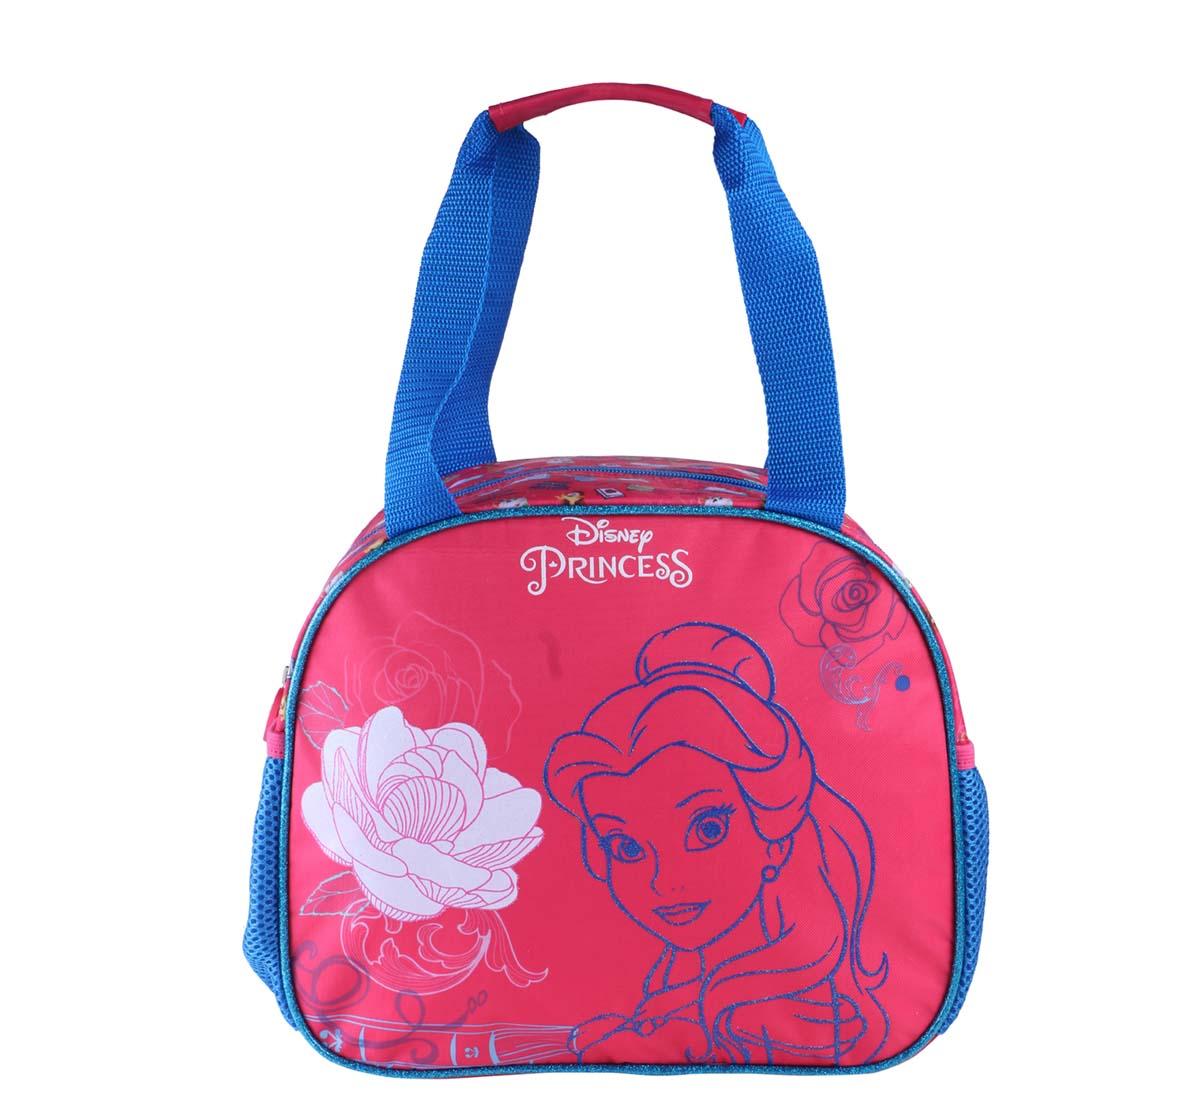 Disney | Disney Princess -Light Pink Travel Bags for Girls age 3Y+